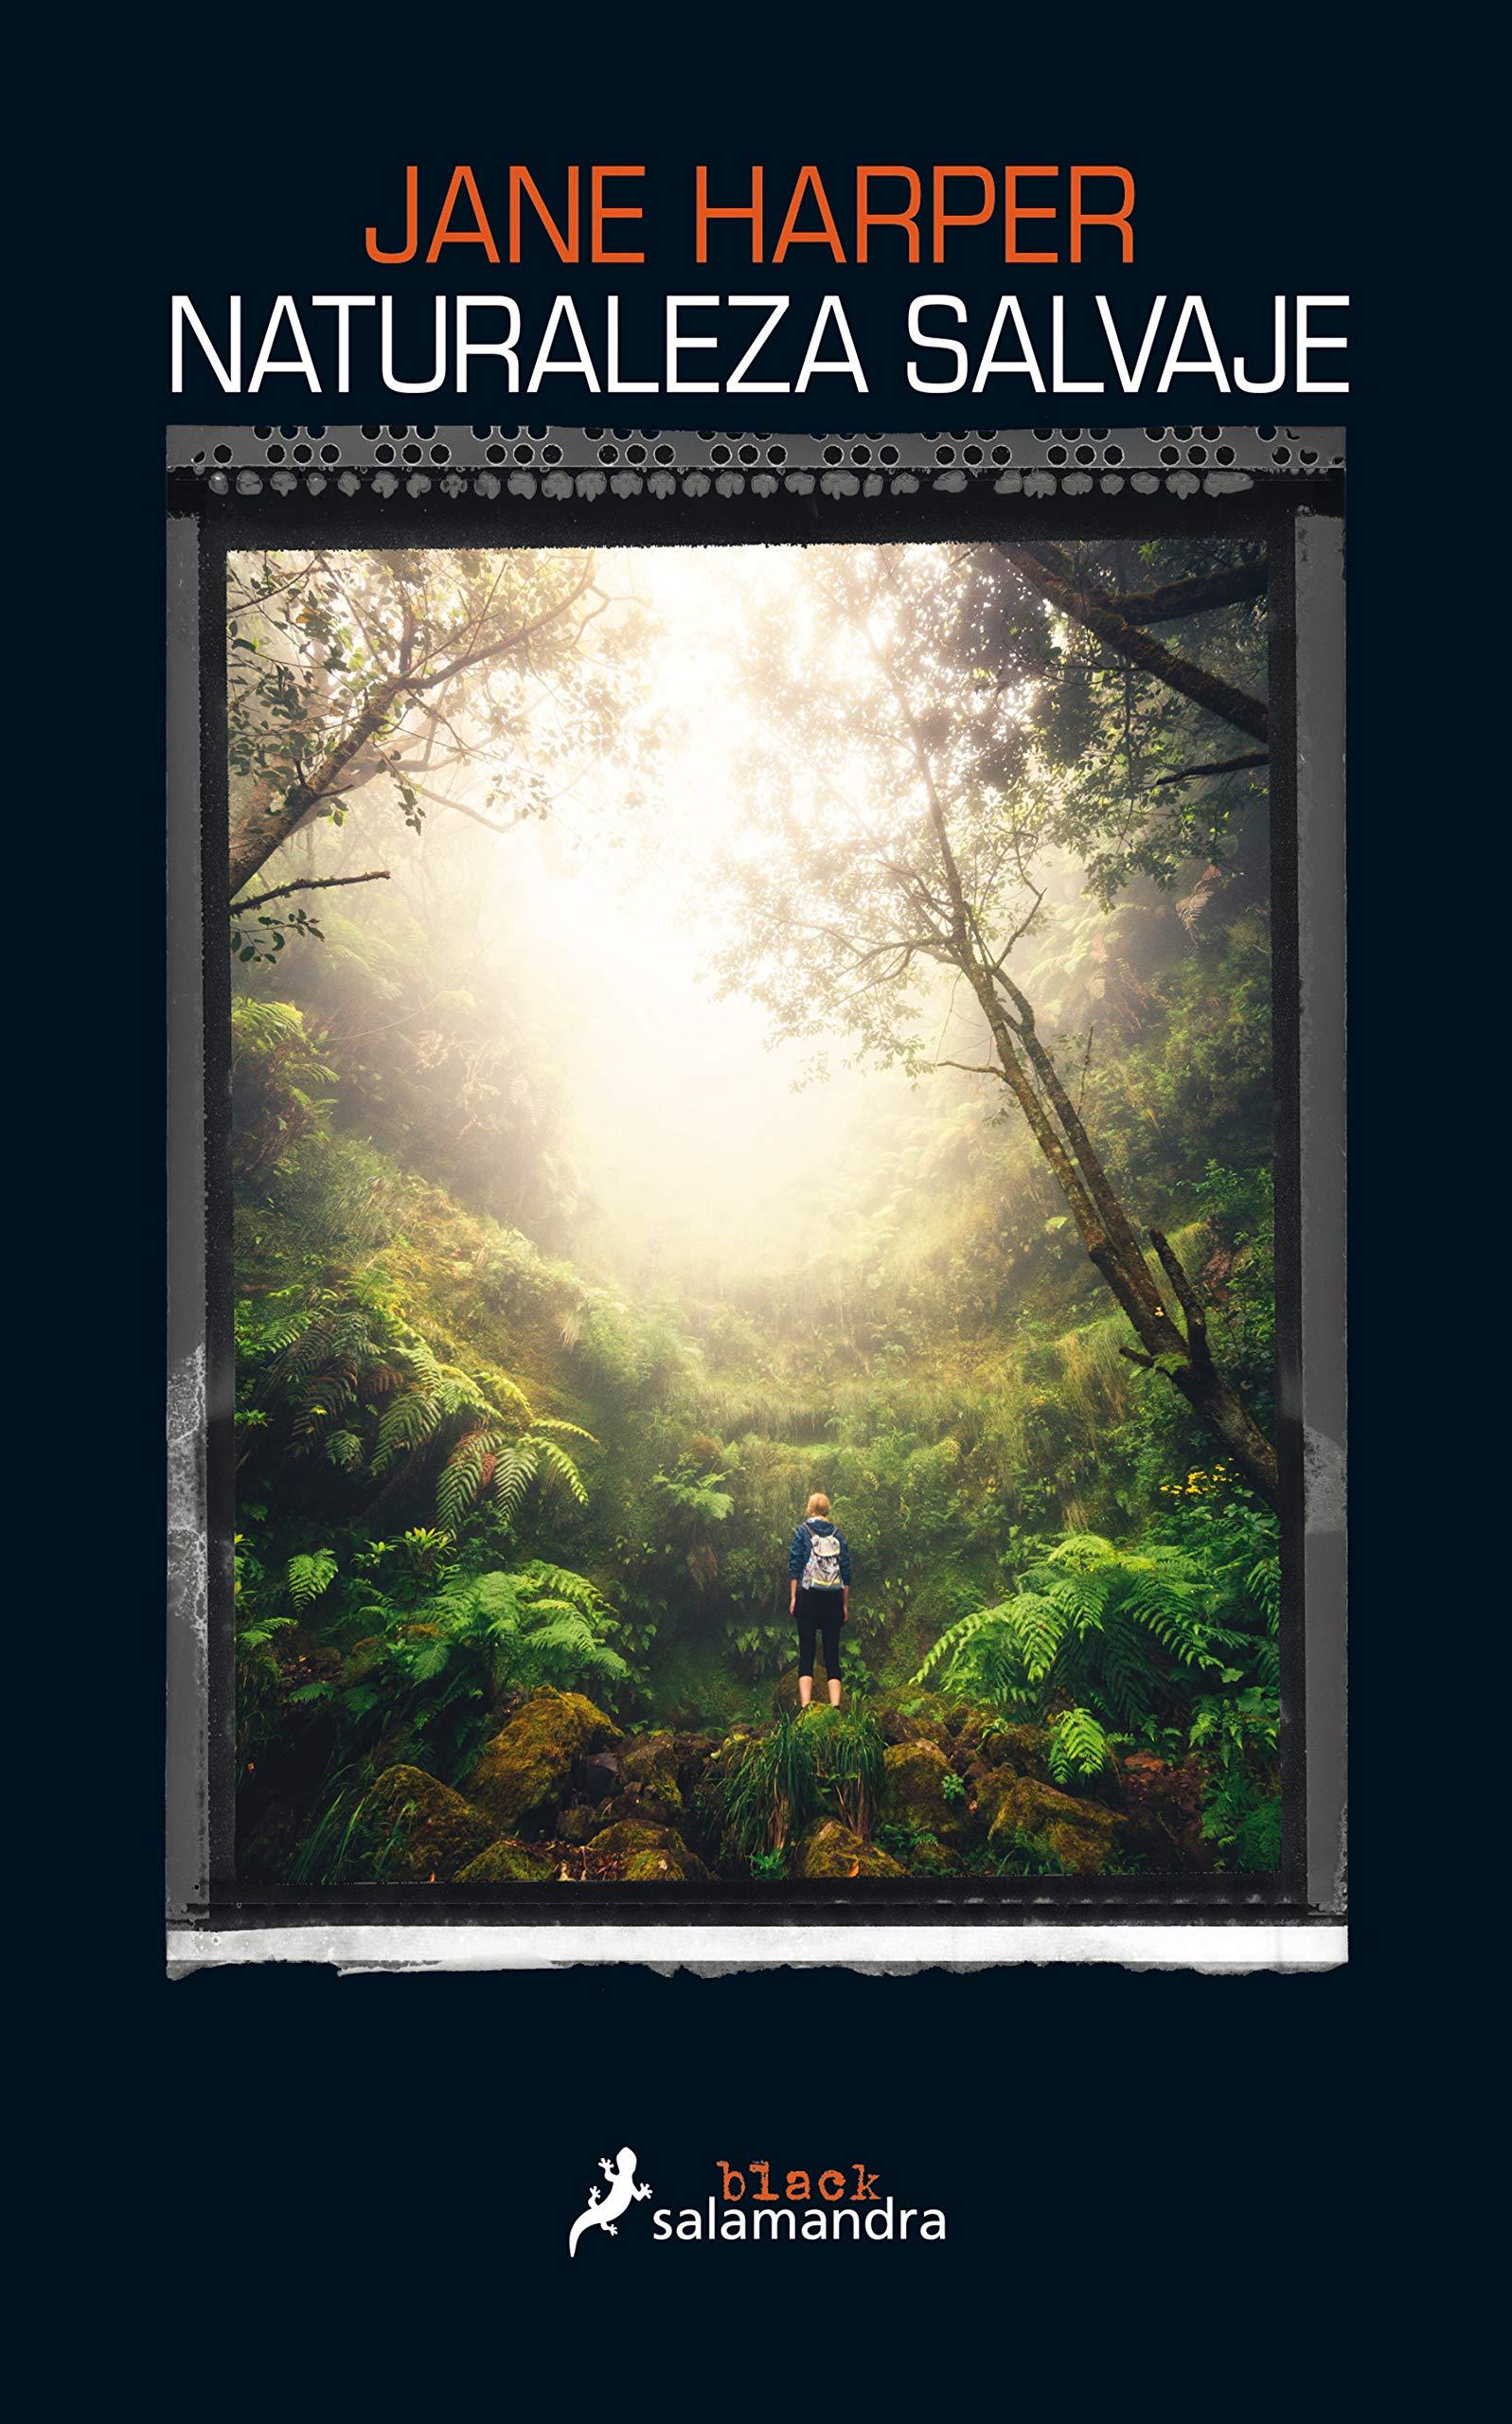 Naturaleza salvaje (Salamandra Black): Amazon.es: Harper, Jane: Libros